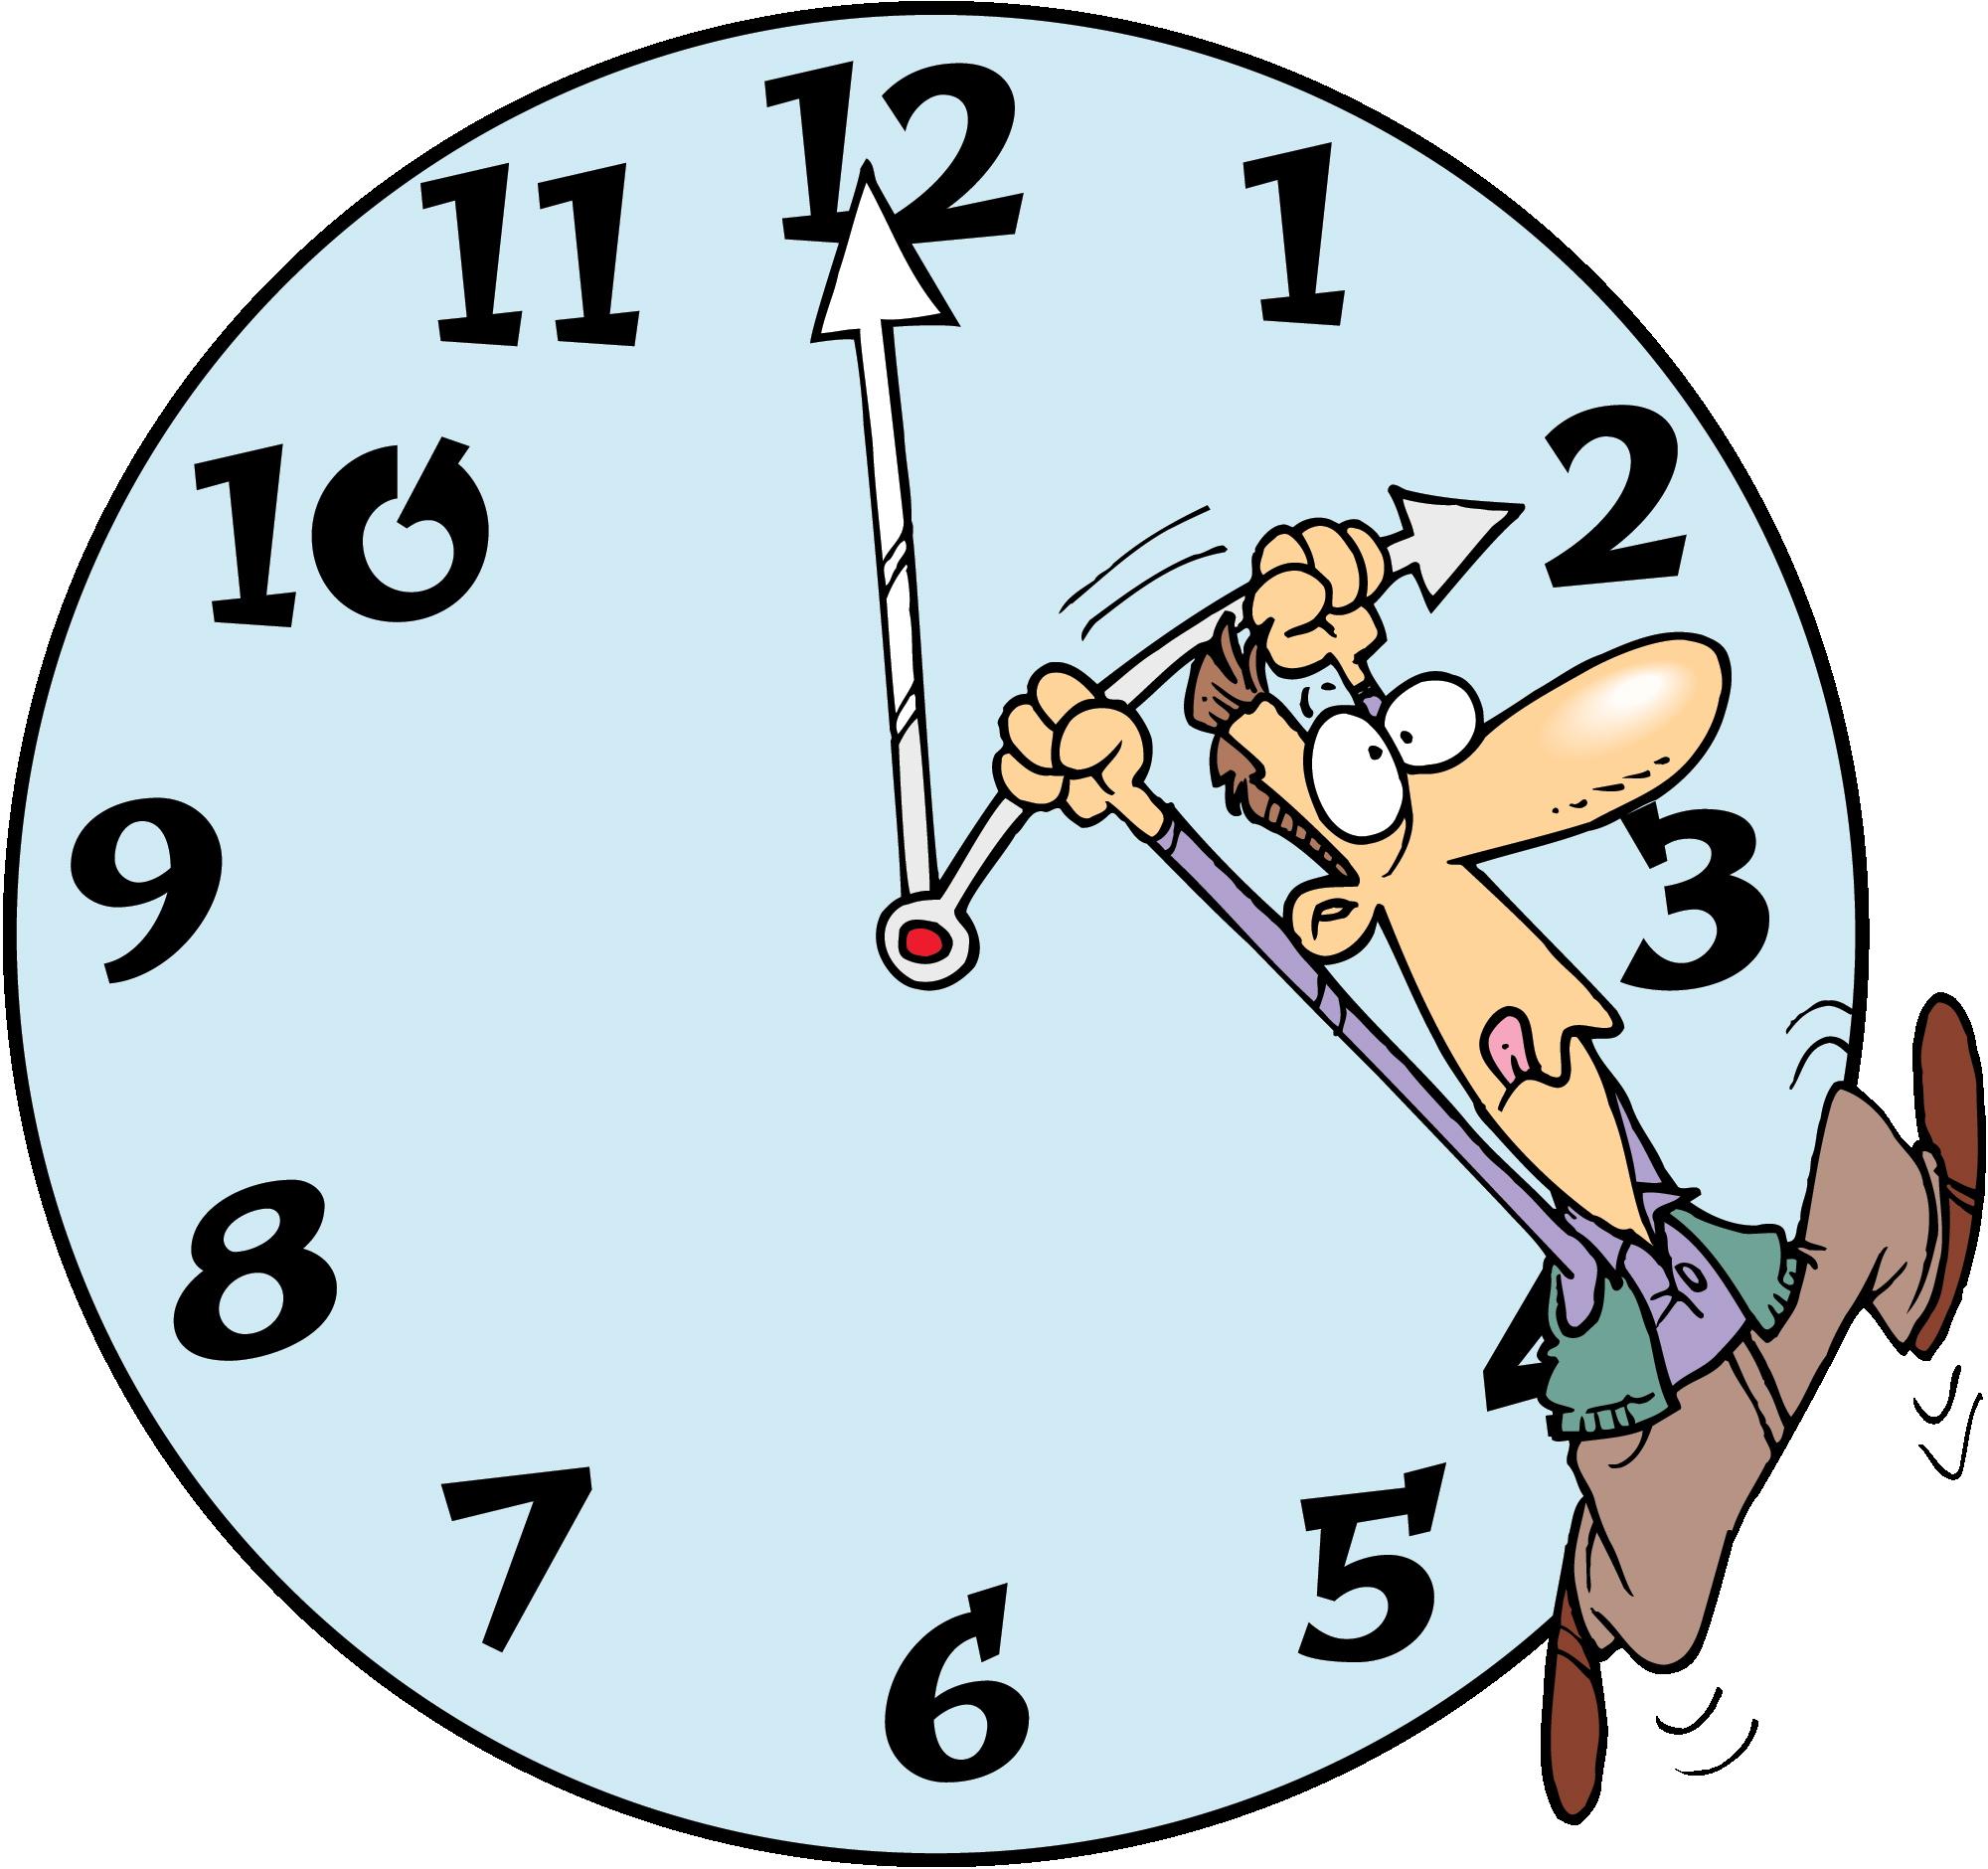 Spring forward clock clipart vector royalty free stock Free Spring Forward Cliparts, Download Free Clip Art, Free ... vector royalty free stock